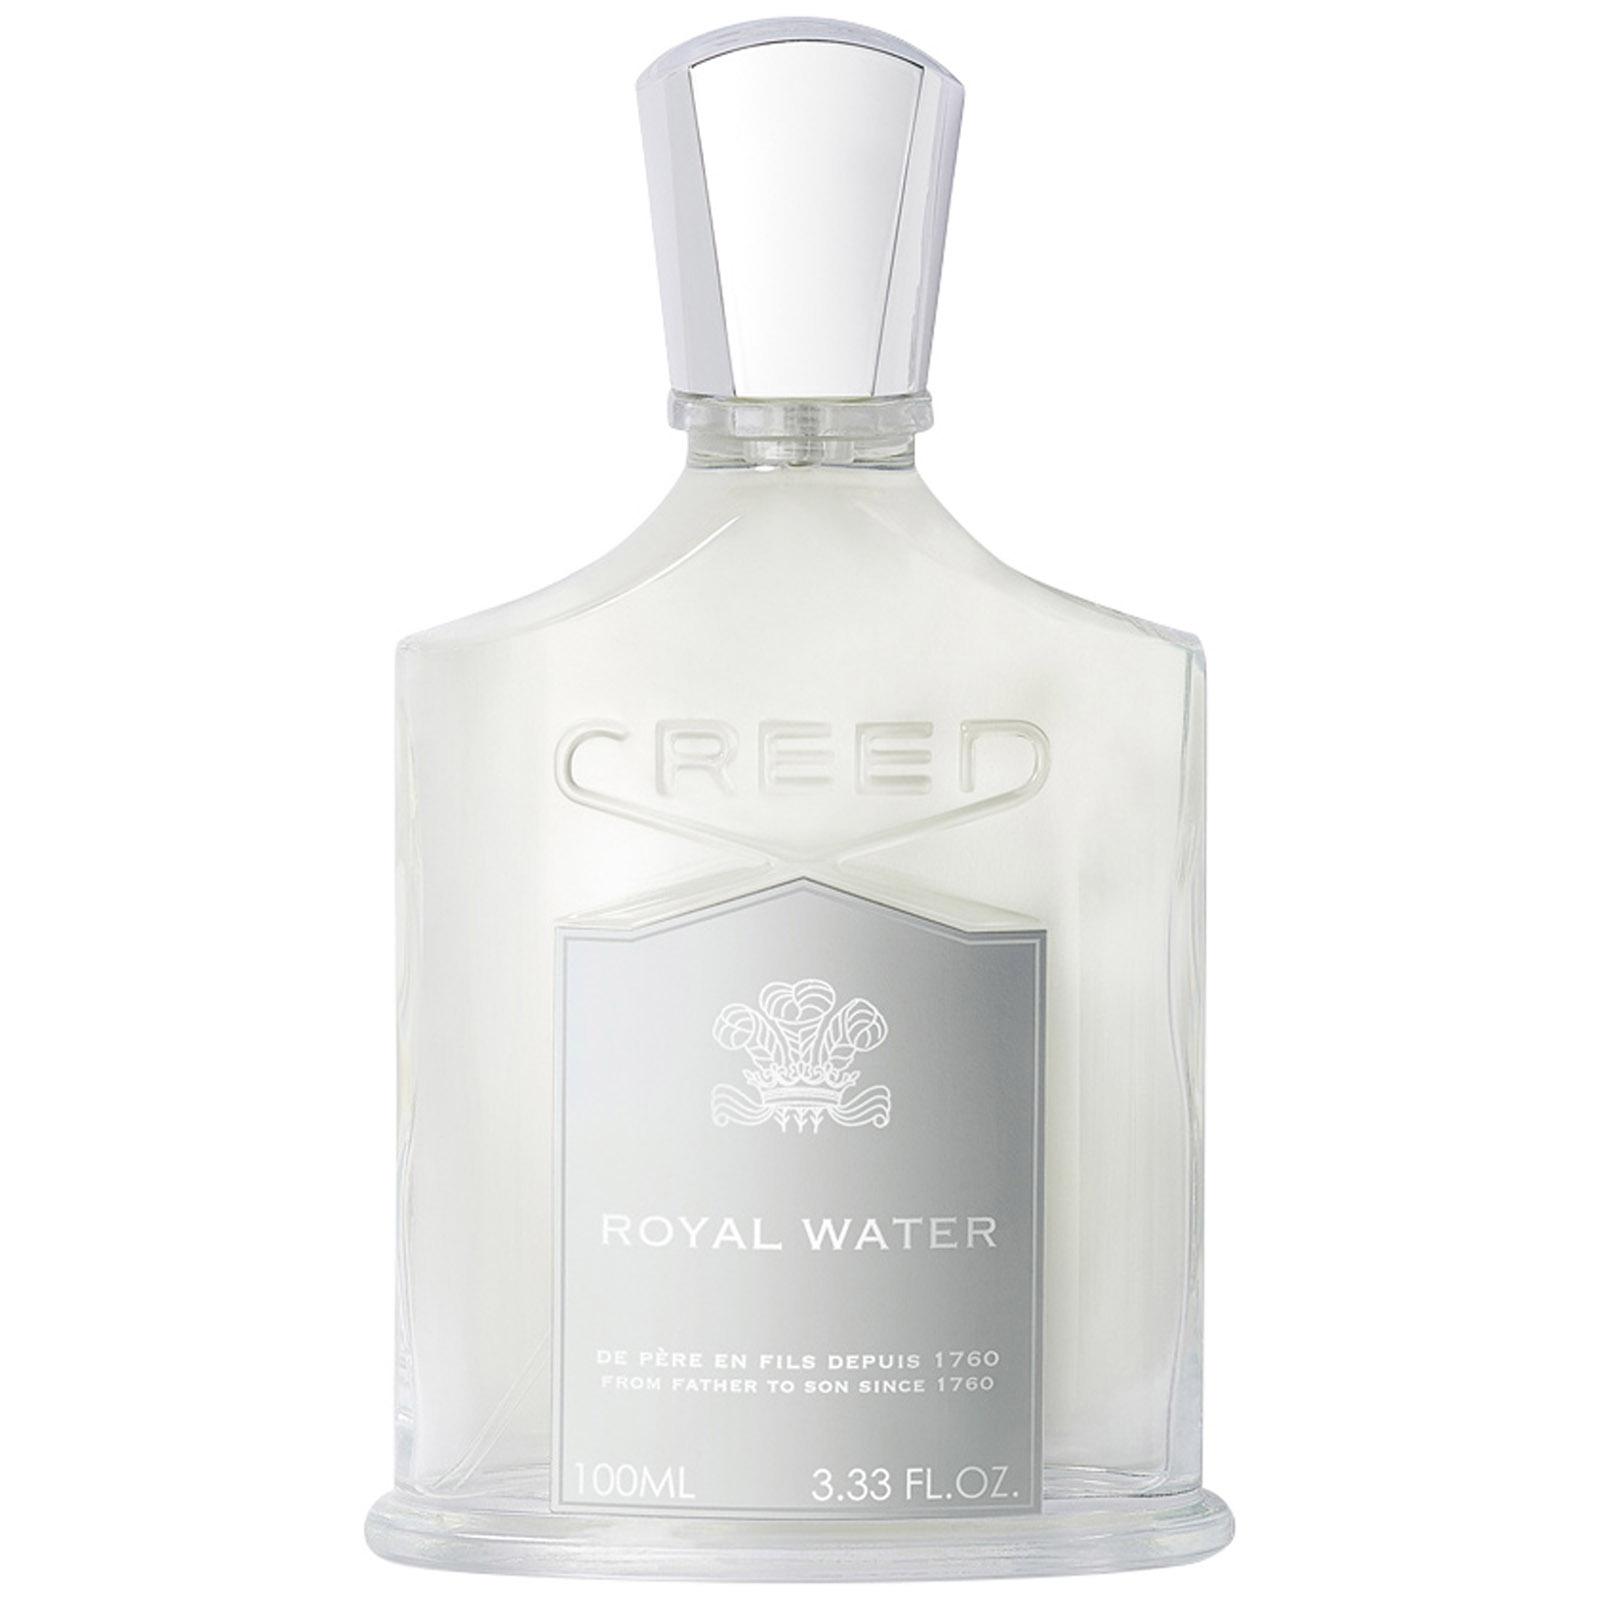 Creed Royal Water Perfume Eau De Parfum 100 ml In White